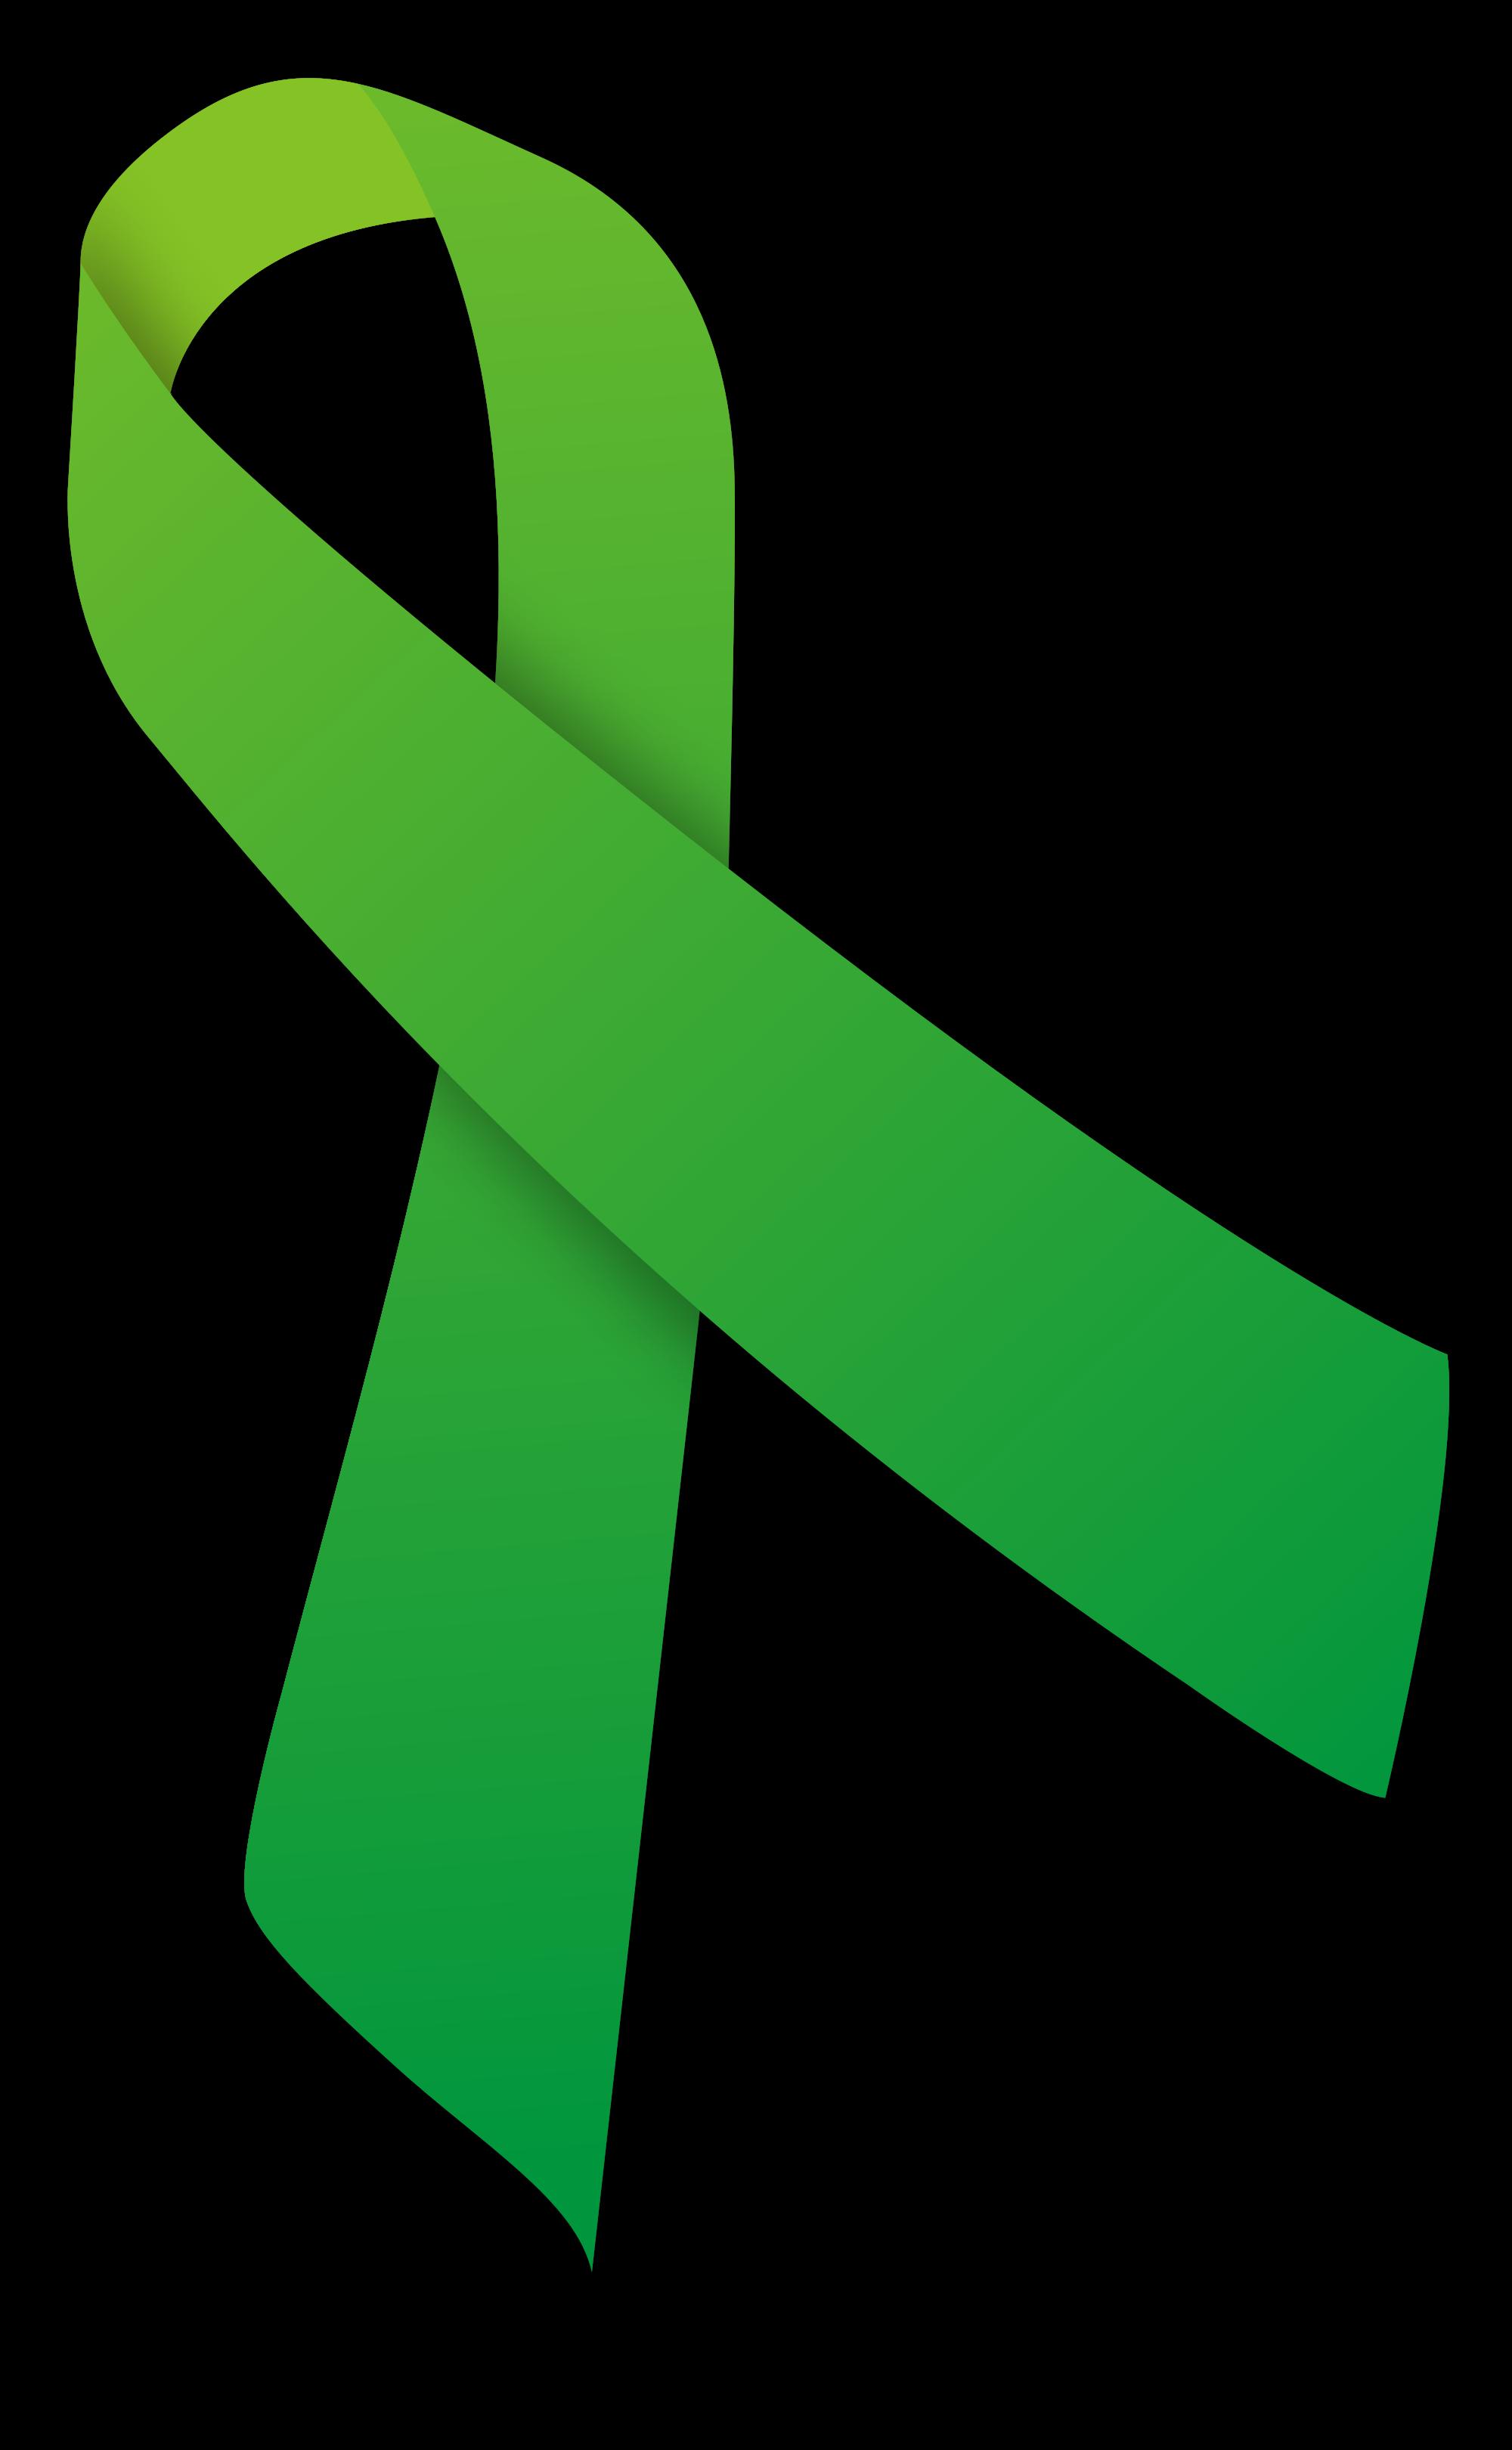 File:Green ribbon.svg - Wikimedia Commons